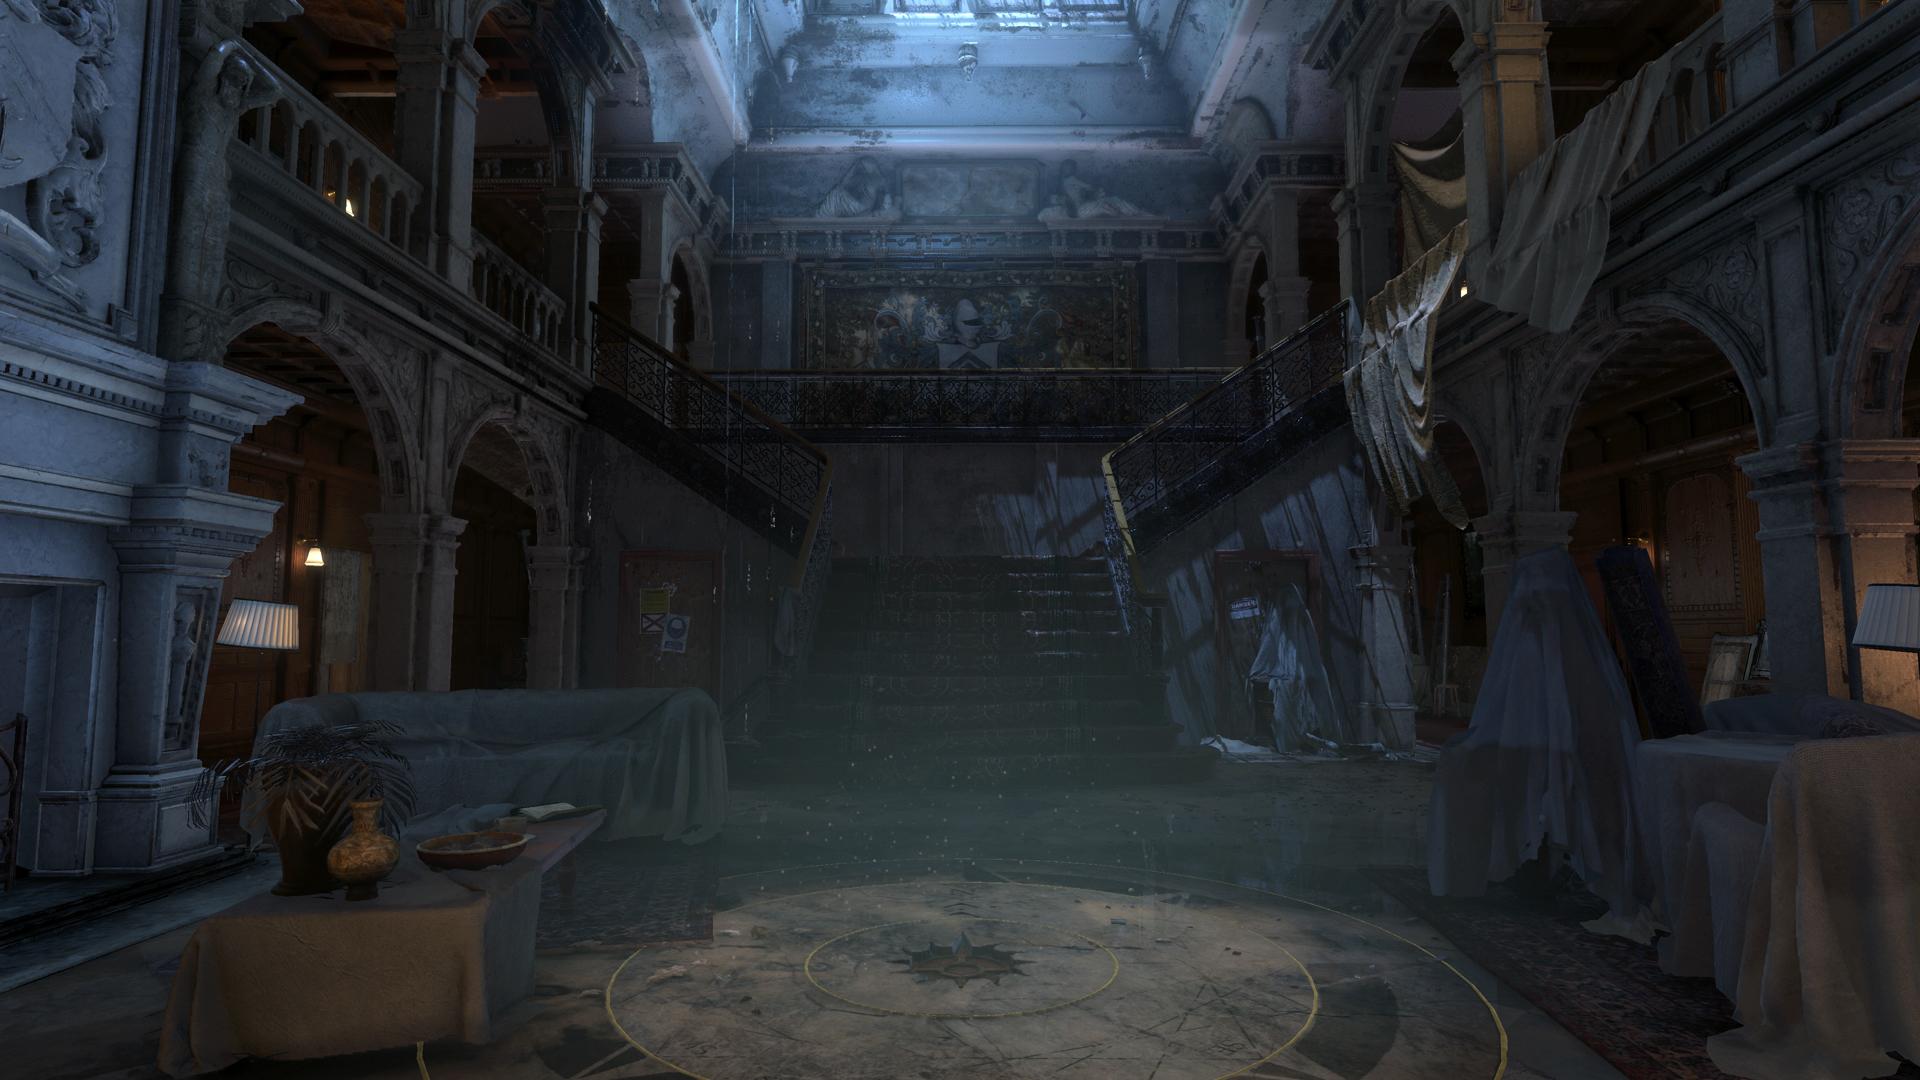 Blood-Tiles-HTC-Vive-Oculus-Rift-SteamVR